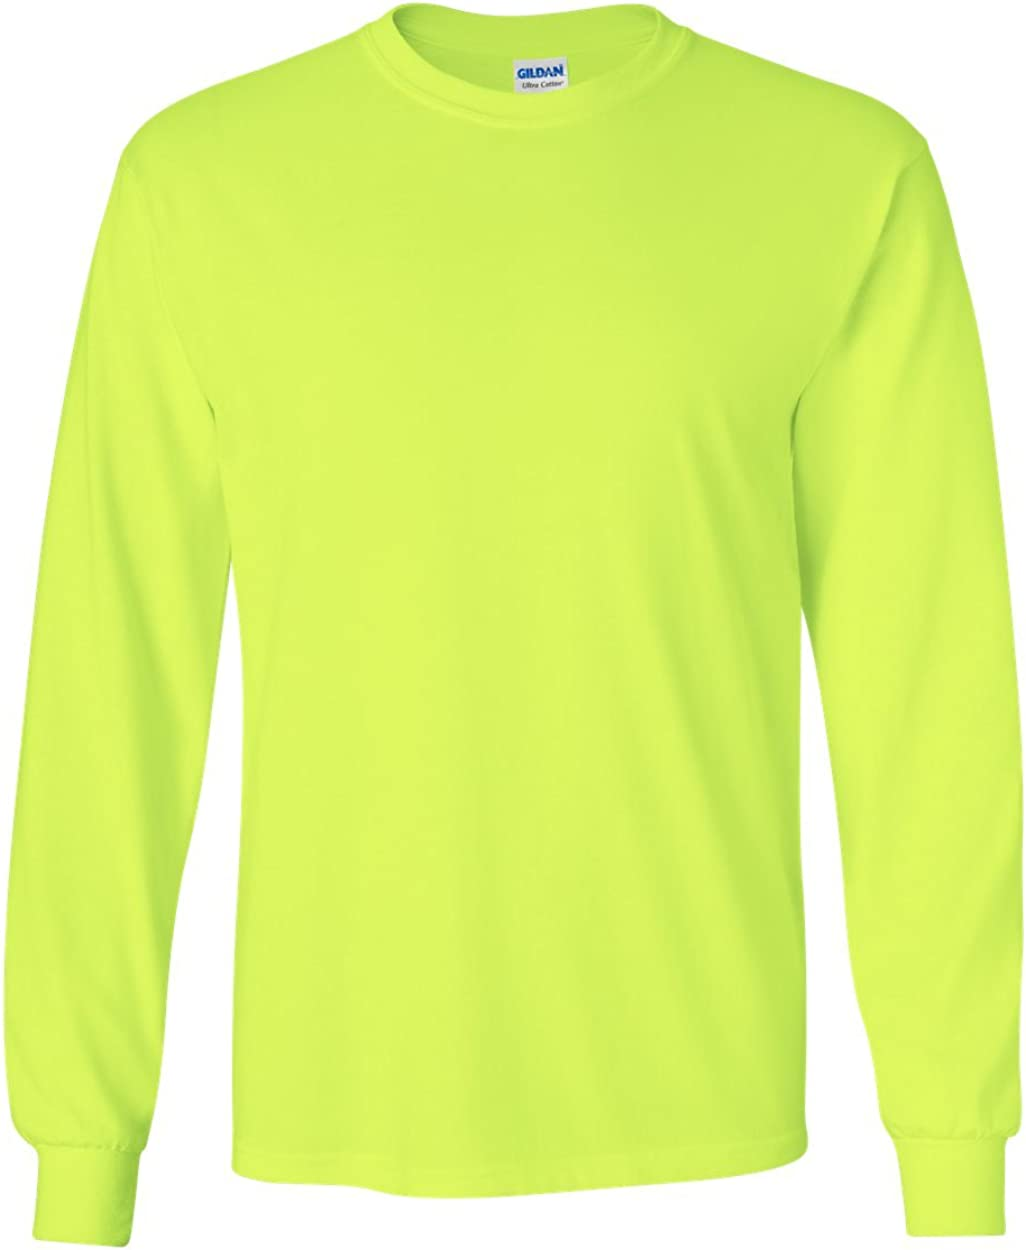 Cotton 6 oz. Long-Sleeve T-Shirt (G240)